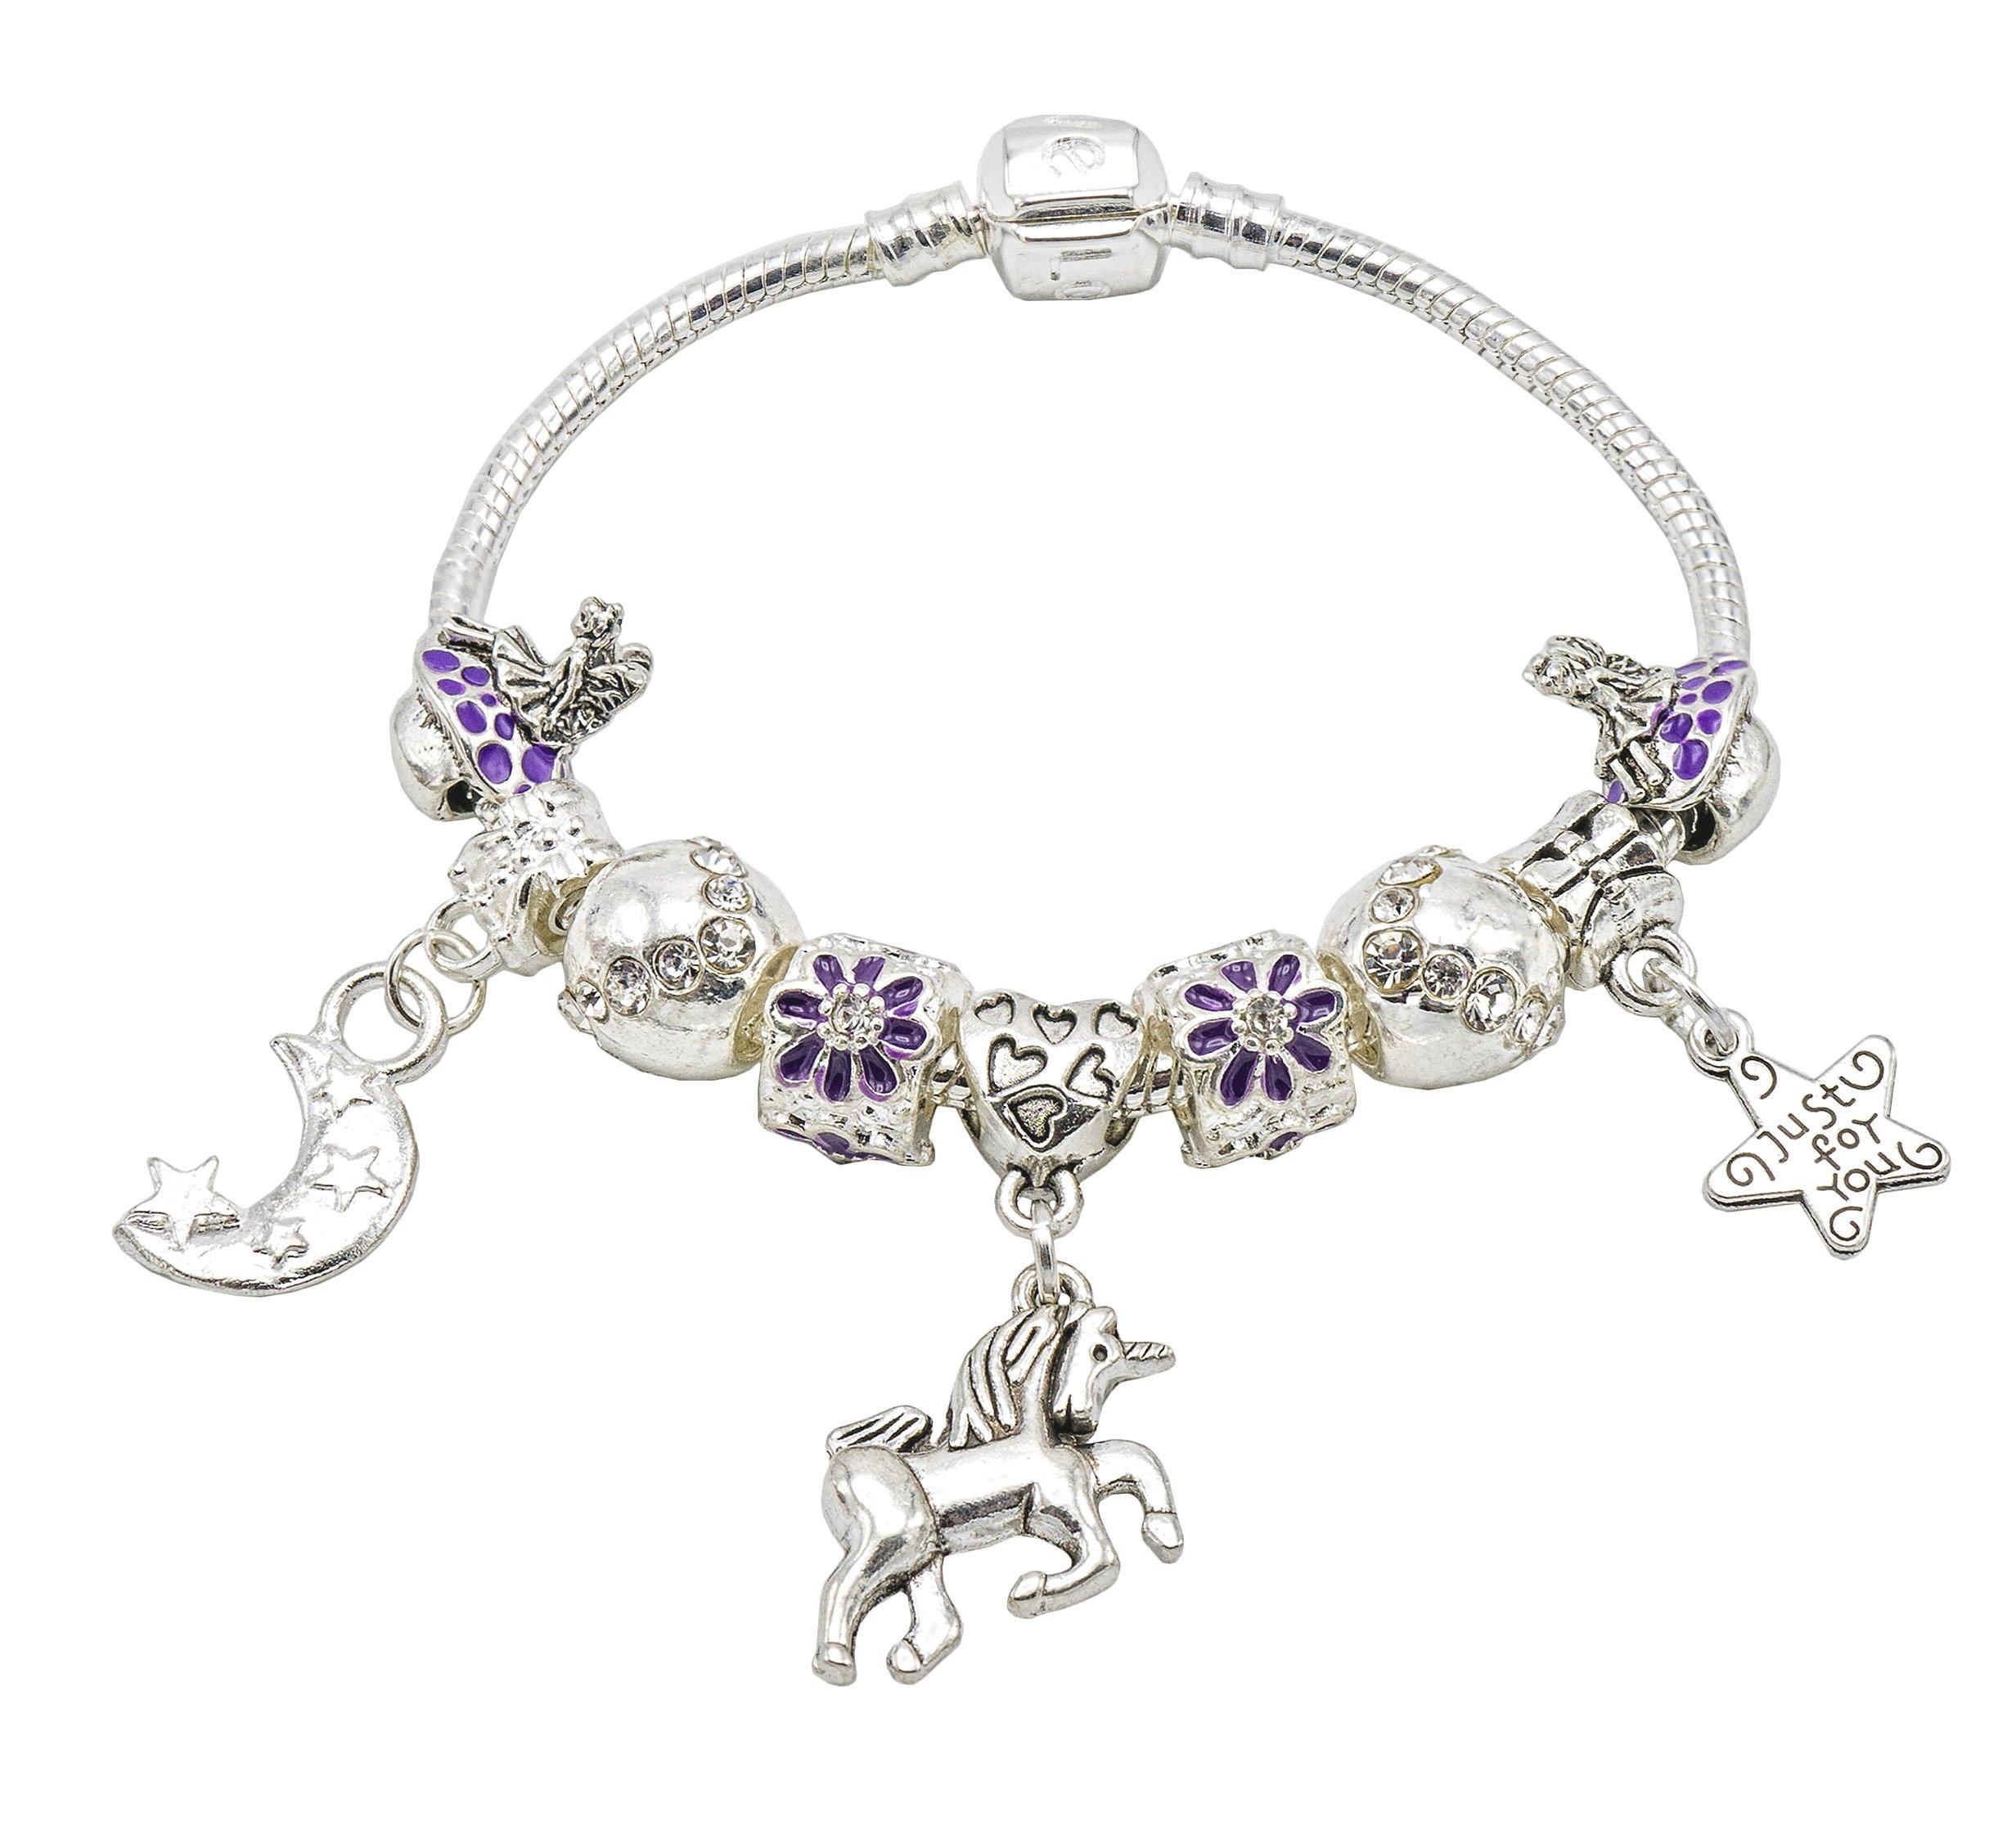 Jewellery Hut Unicorn and Fairies Charm Bracelet for Girls with Gift Box – Girls Unicorn Jewellery